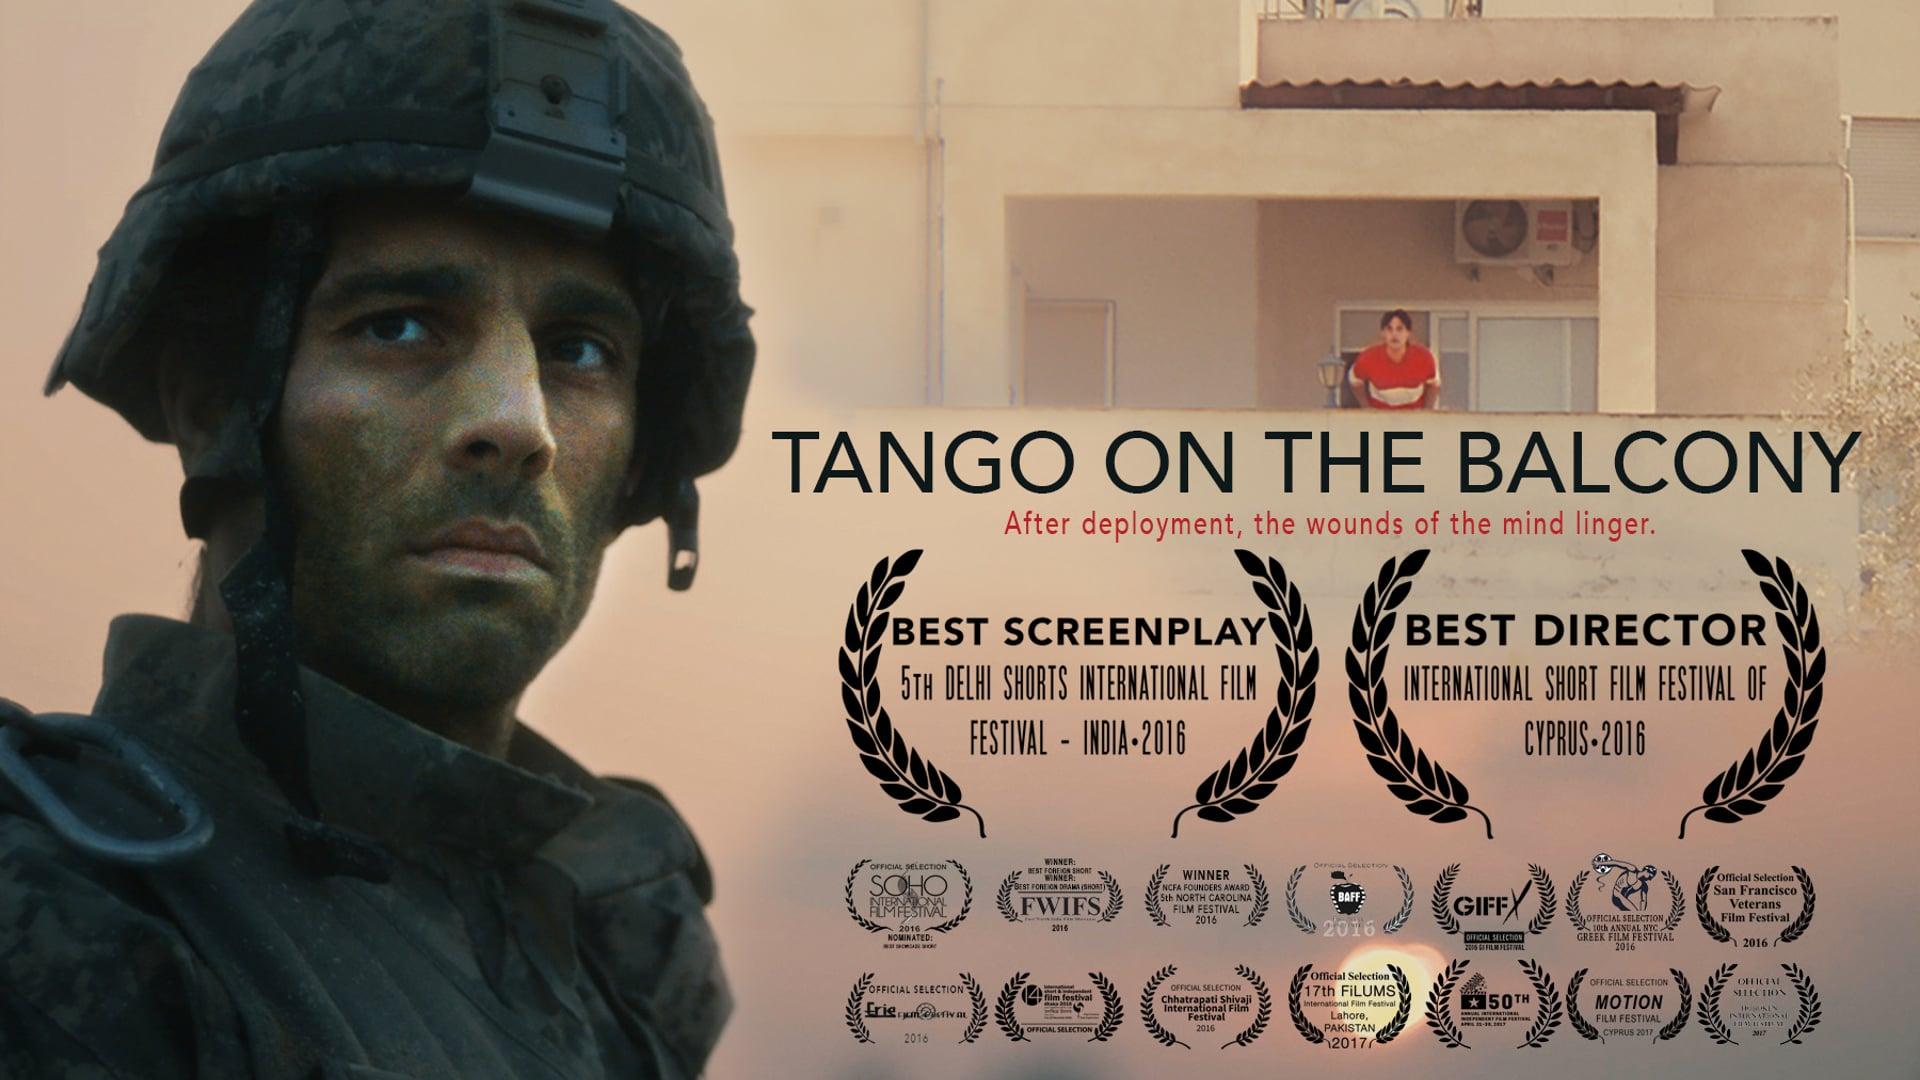 Tango on the Balcony • Trailer